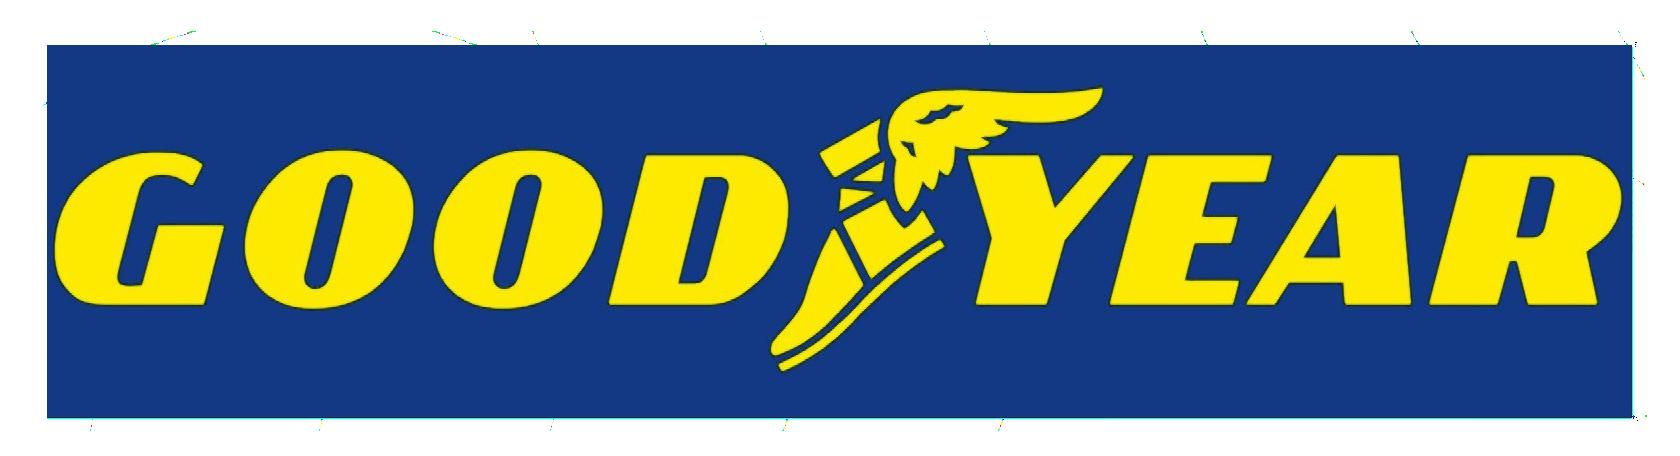 goodyear tyre logo